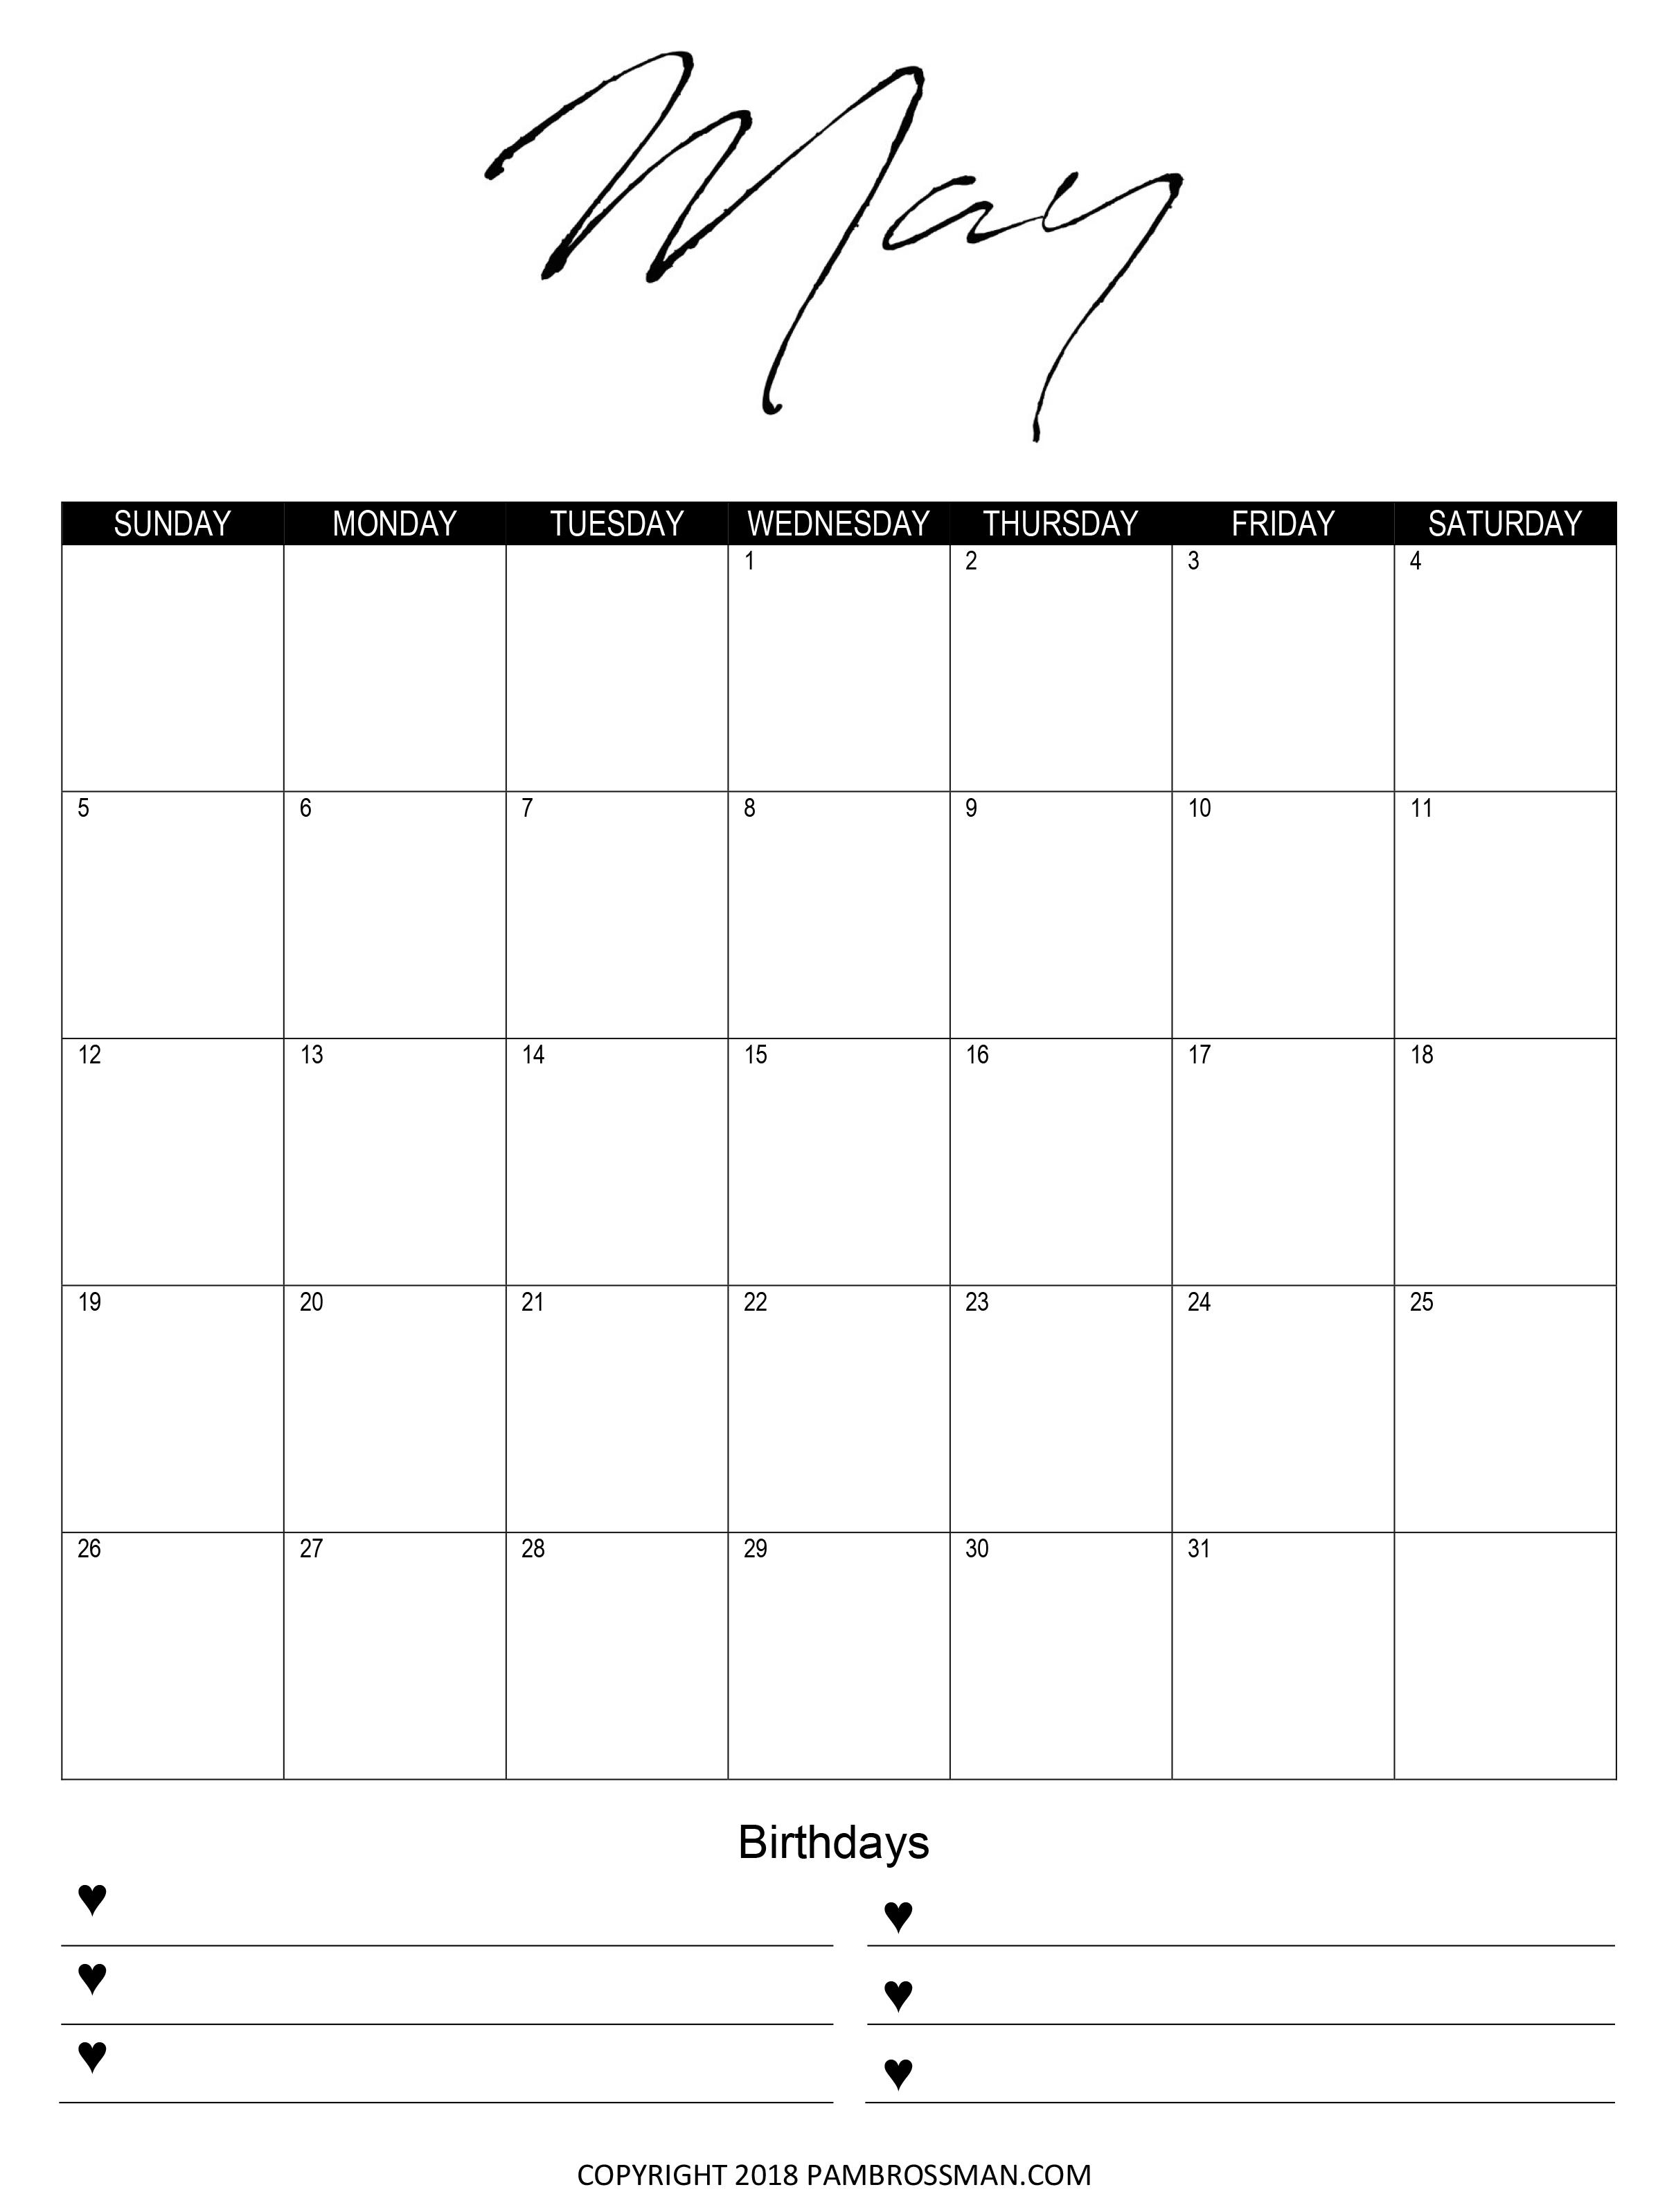 Free Printable Calendar Pam Brossman